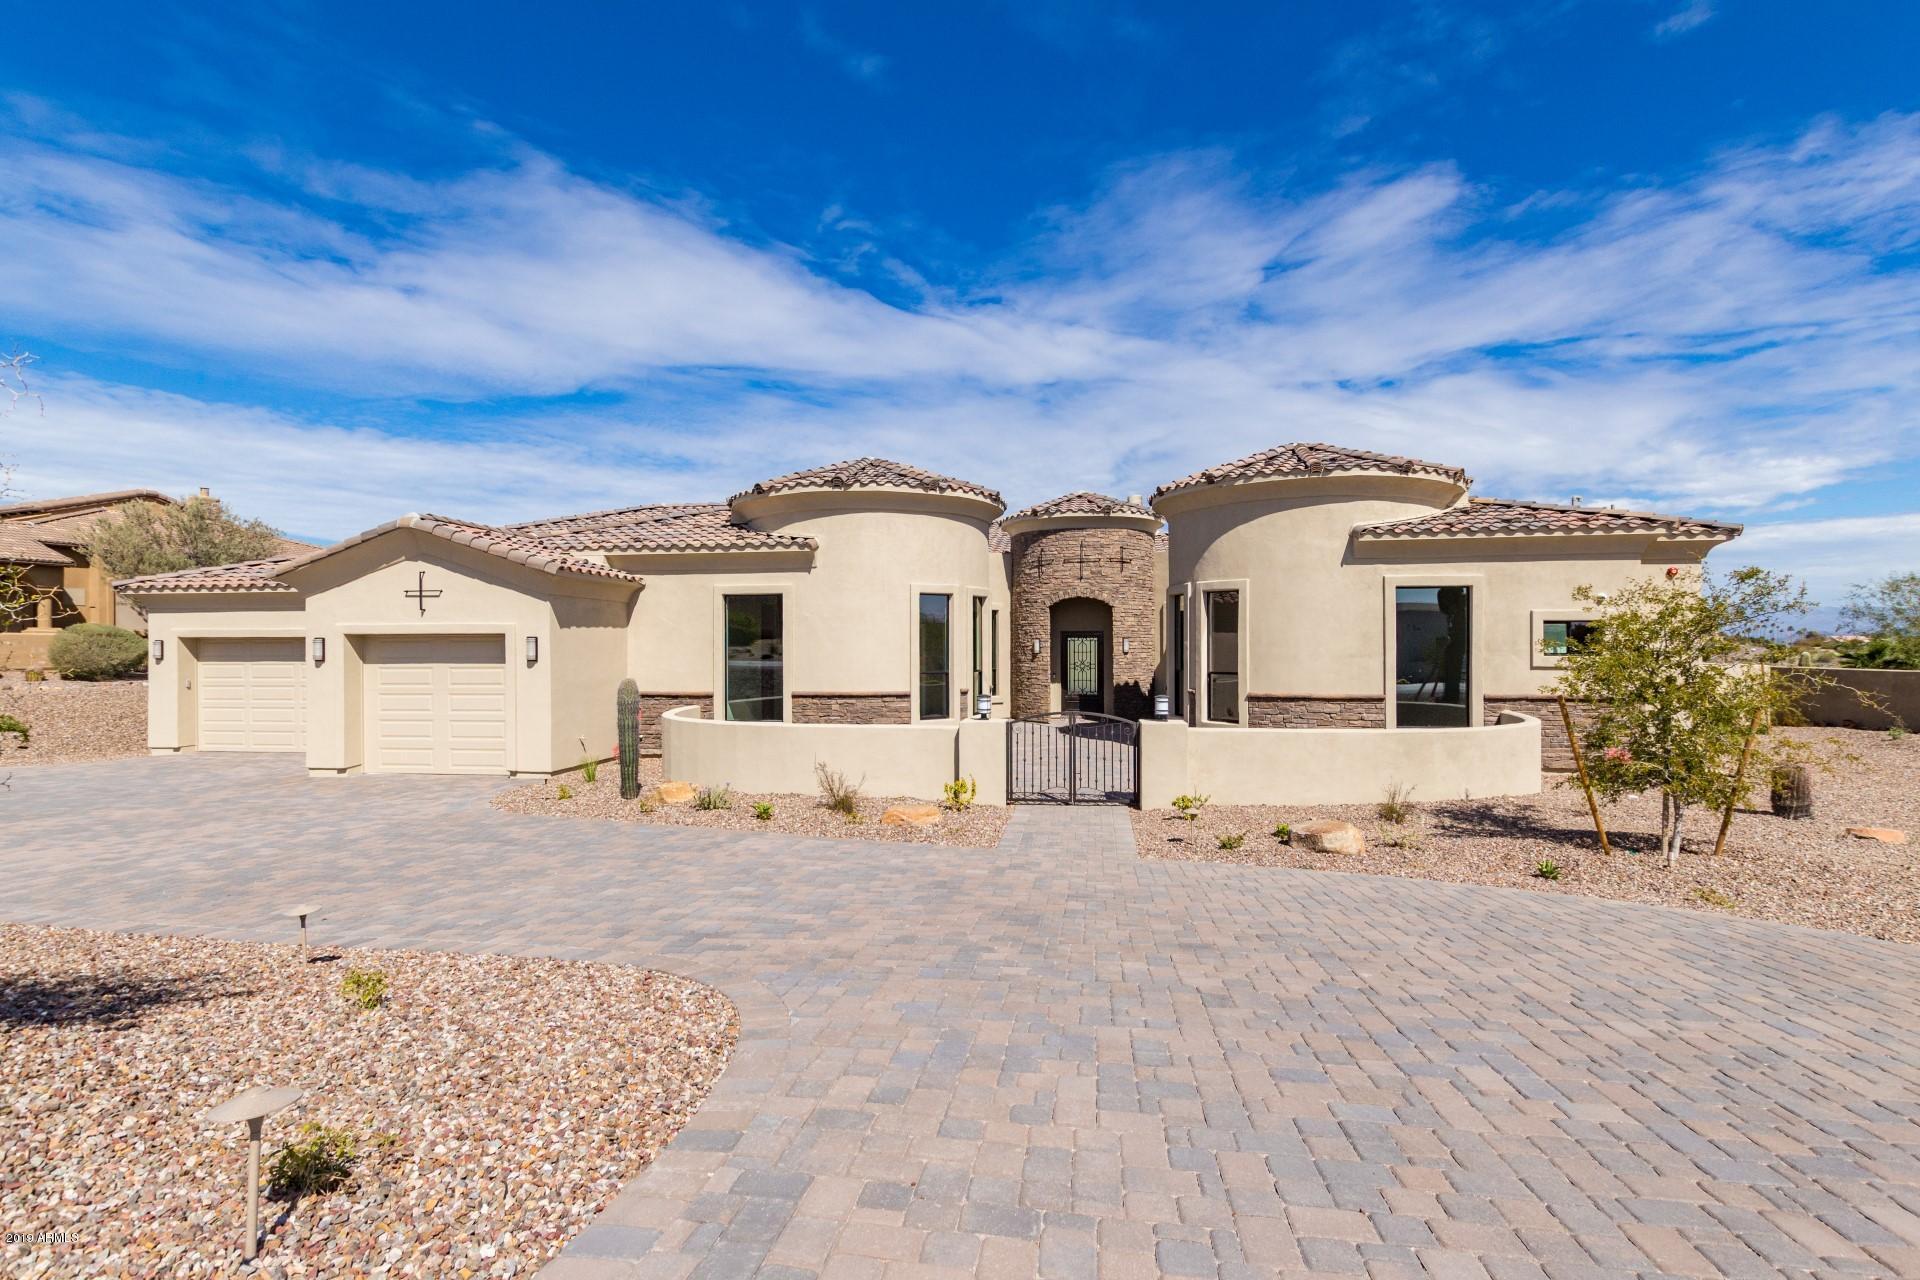 Photo of 15538 E PALATIAL Drive, Fountain Hills, AZ 85268